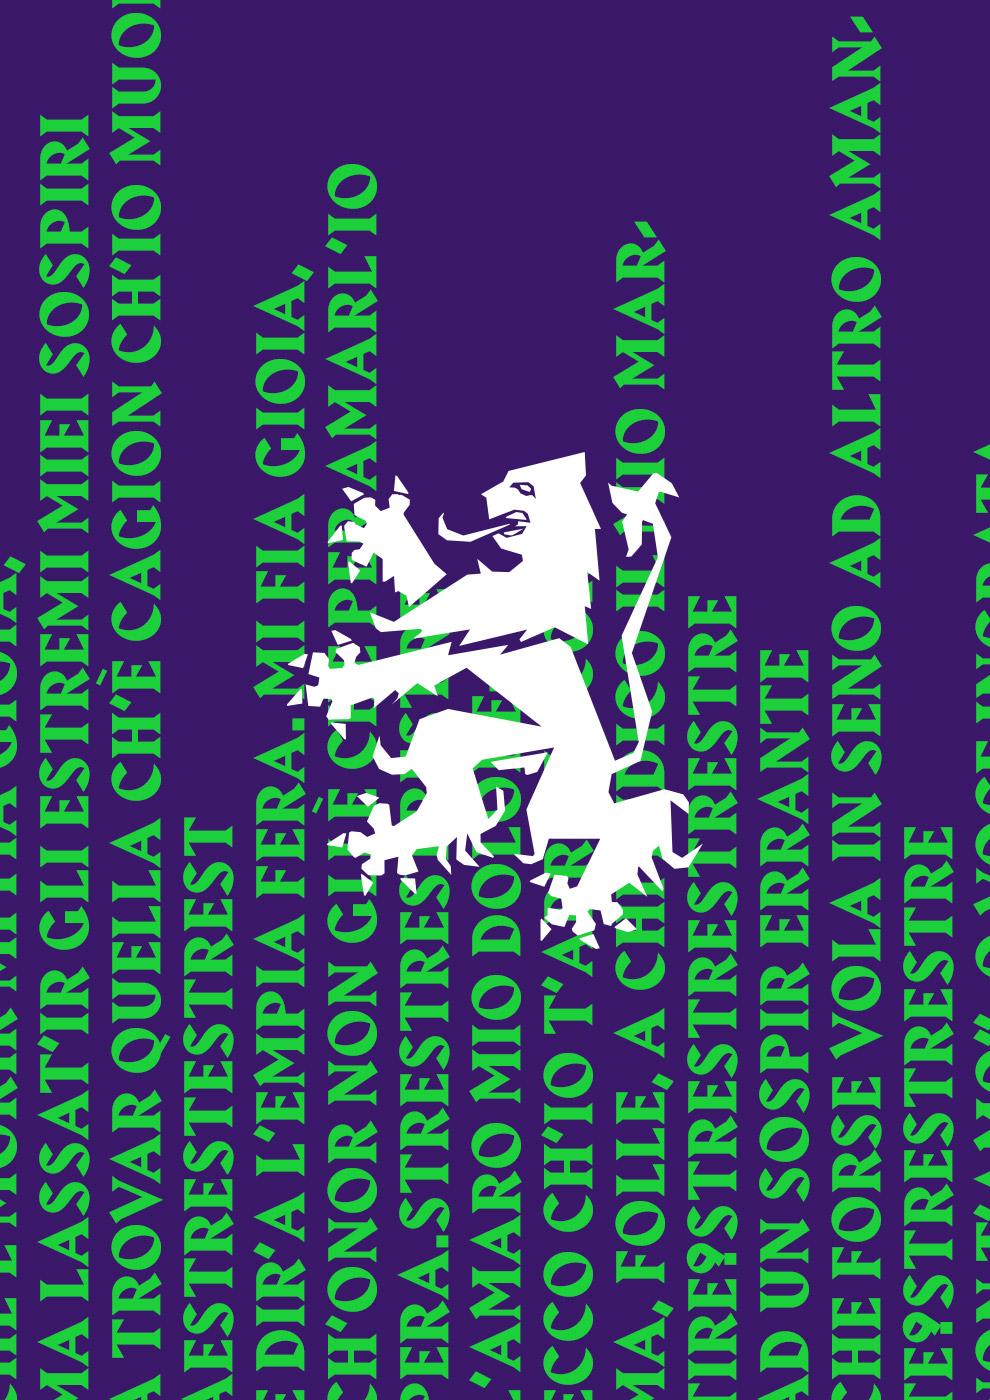 Gesualdo Reloaded – Matera 2019 - Fonts In Use